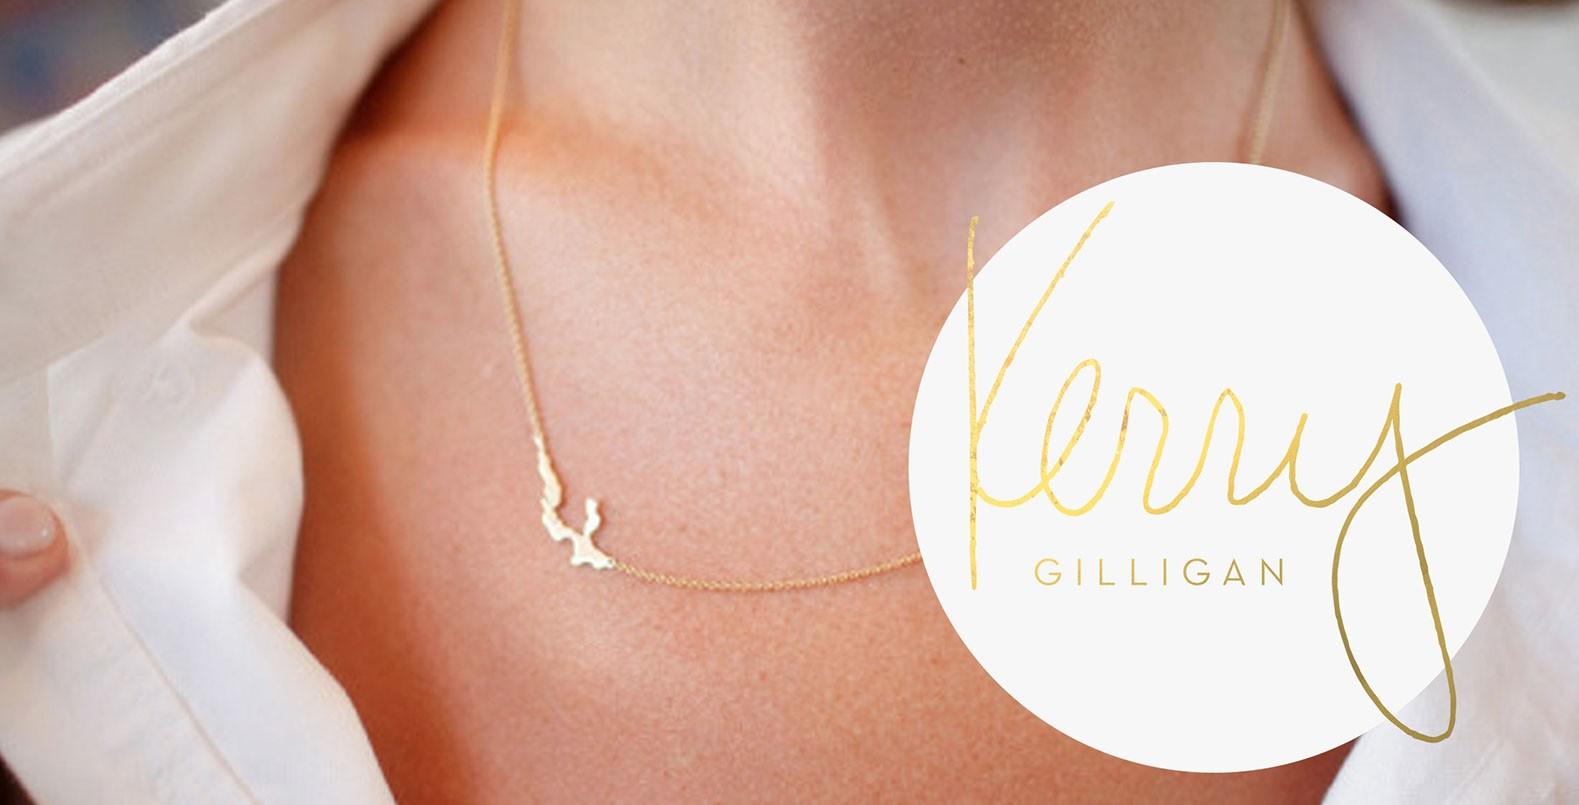 Kerry Gilligan, logo design for a fashion brand, jewelry line